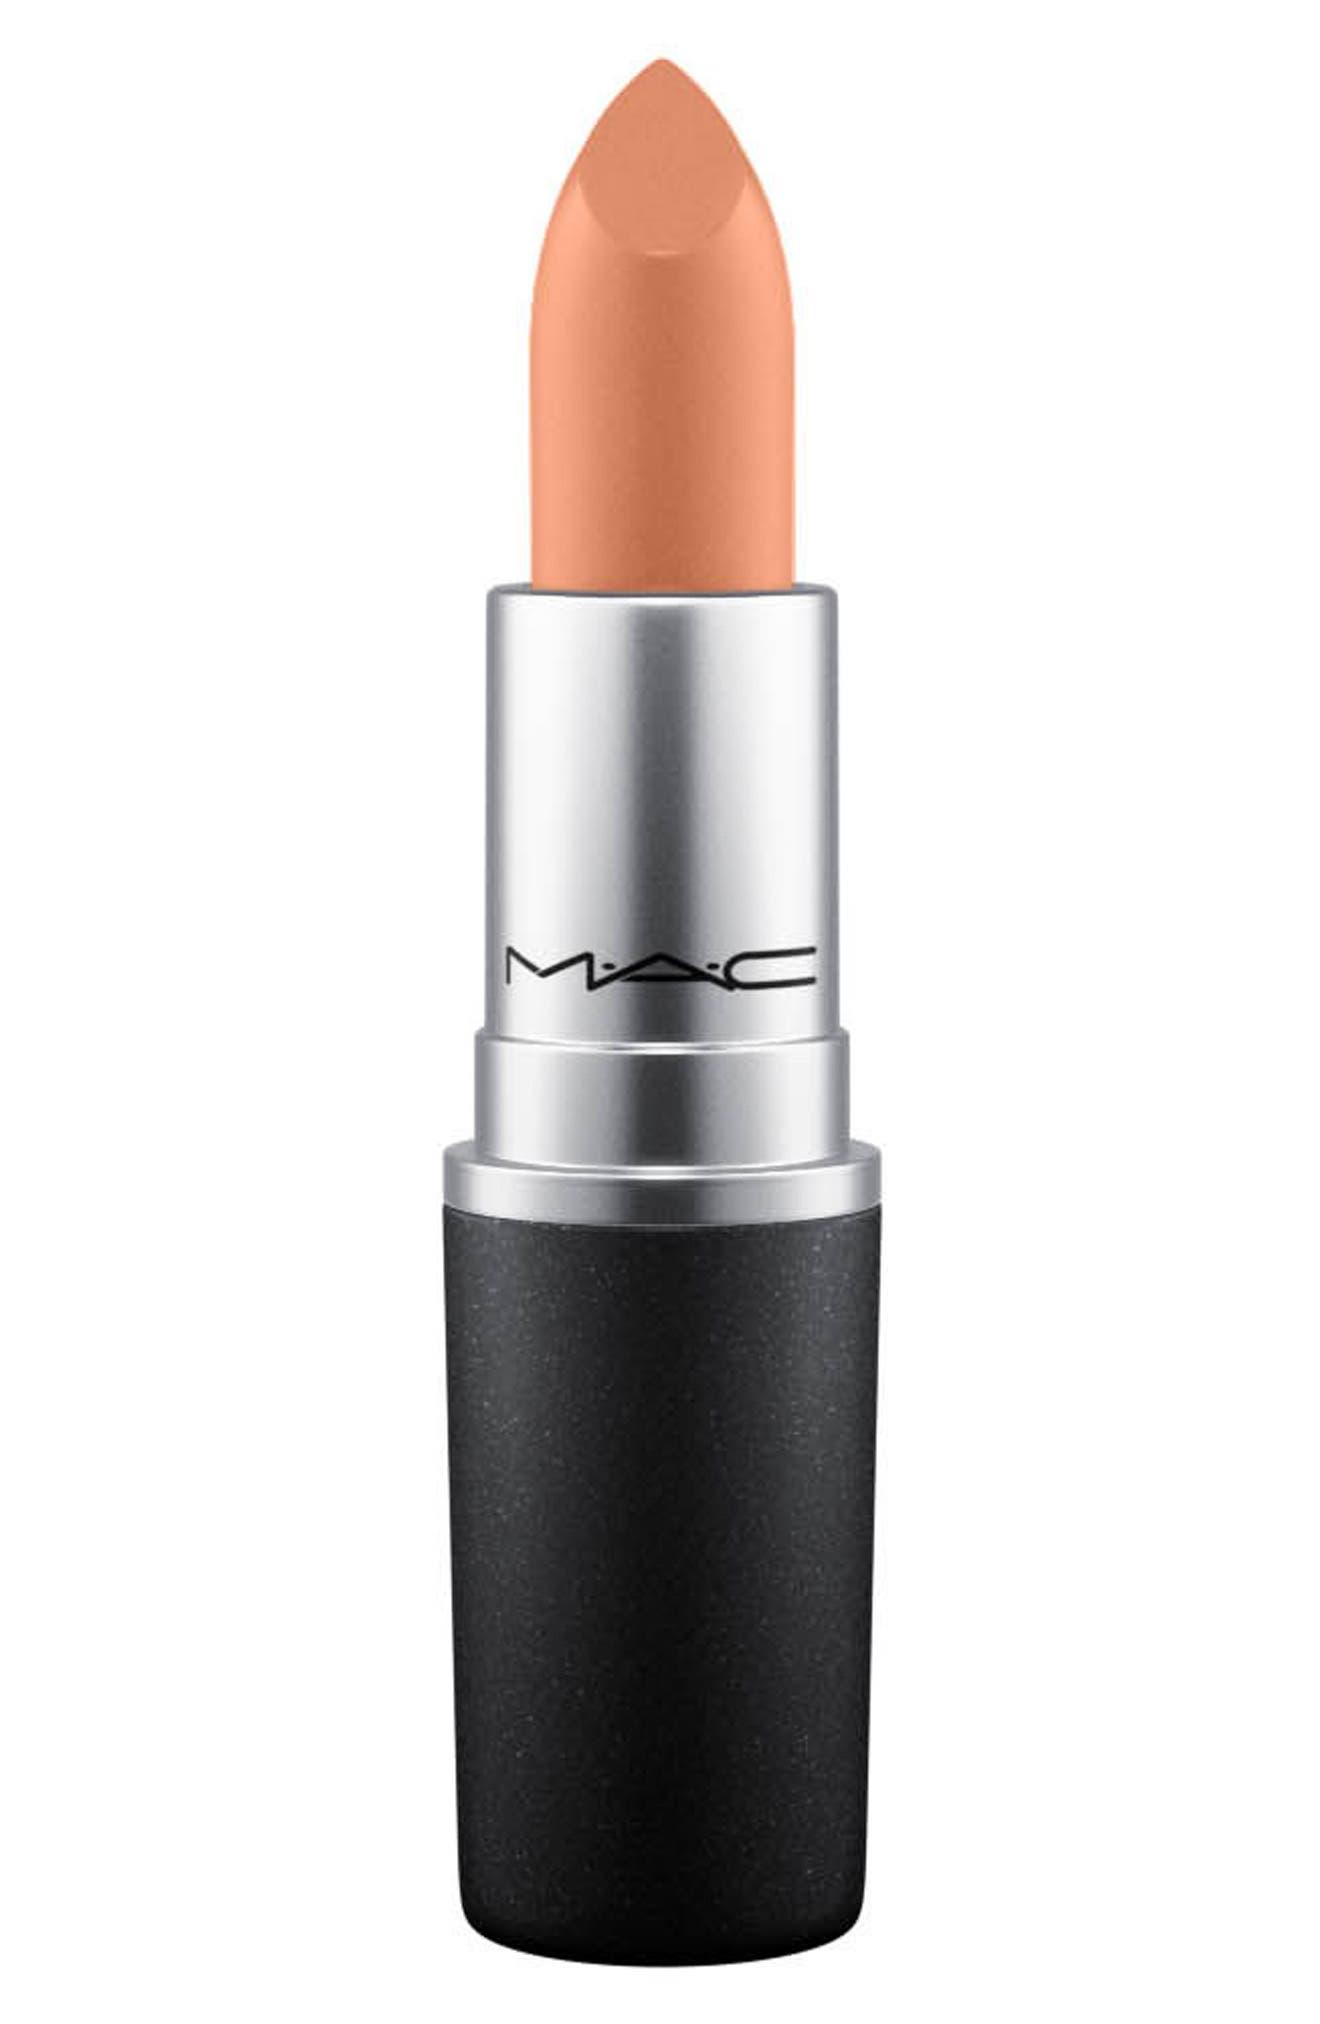 MAC Nudes Lipstick (Limited Edition)